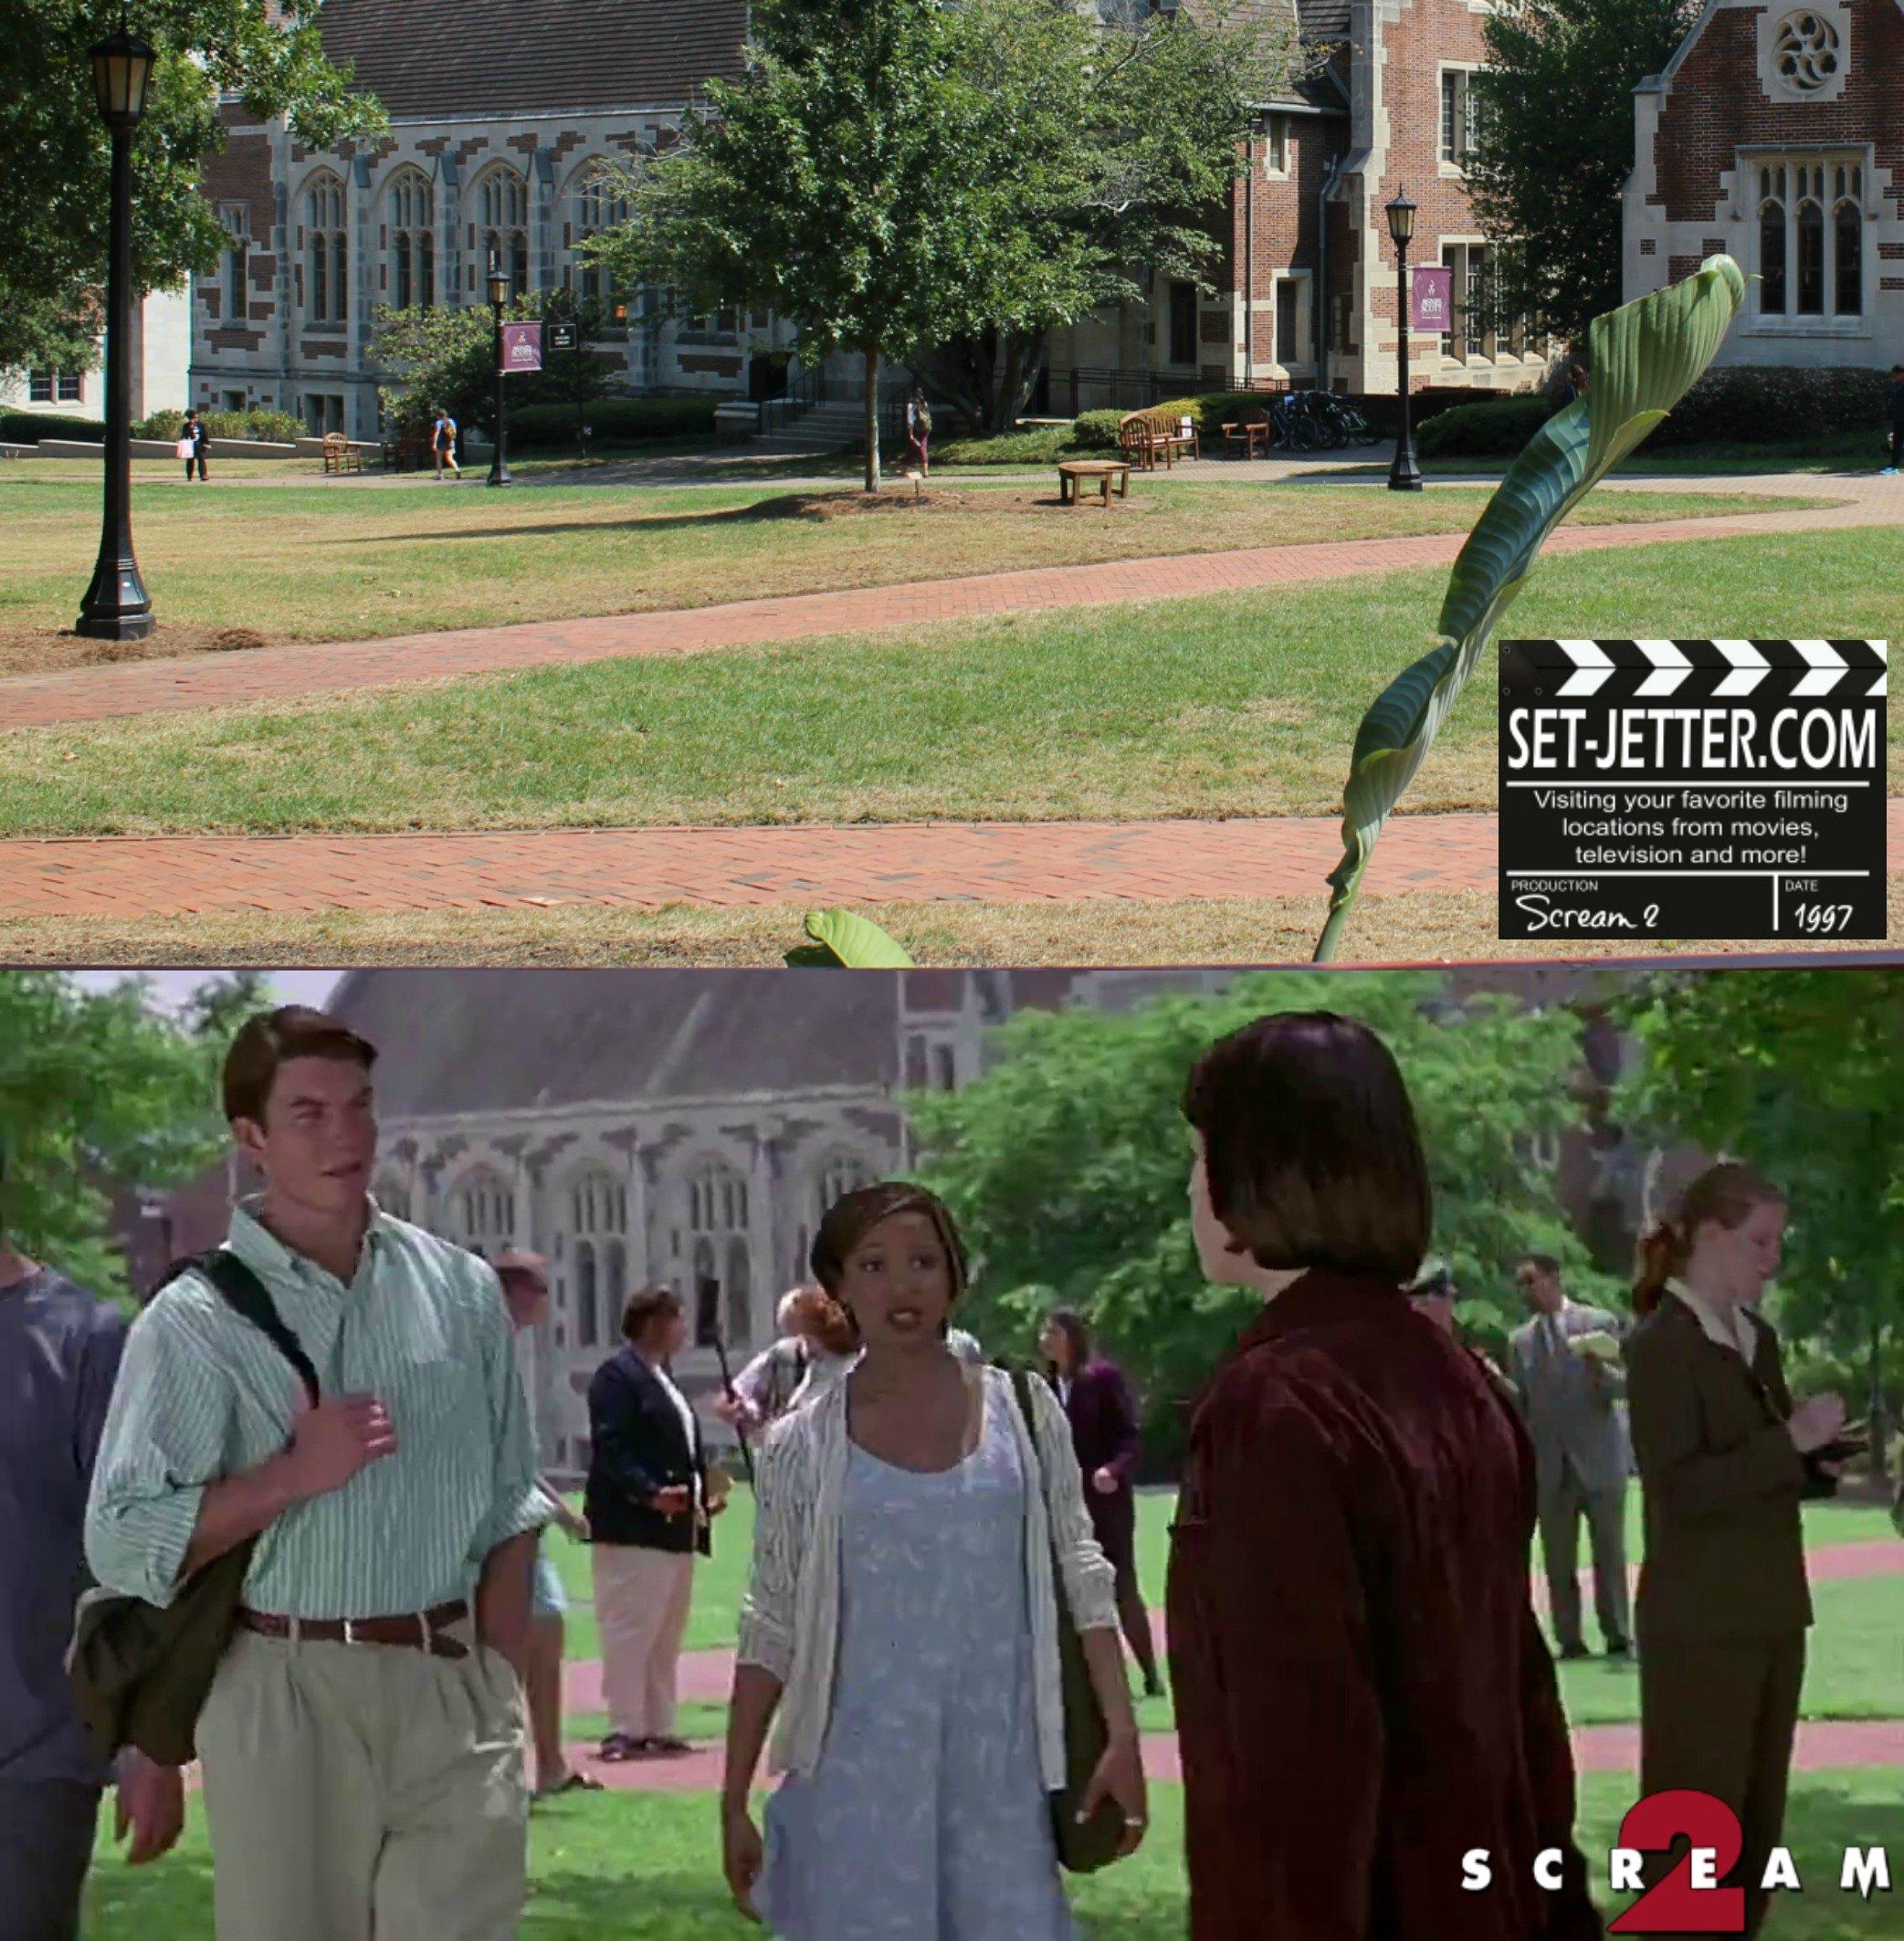 Scream 2 comparison 73.jpg